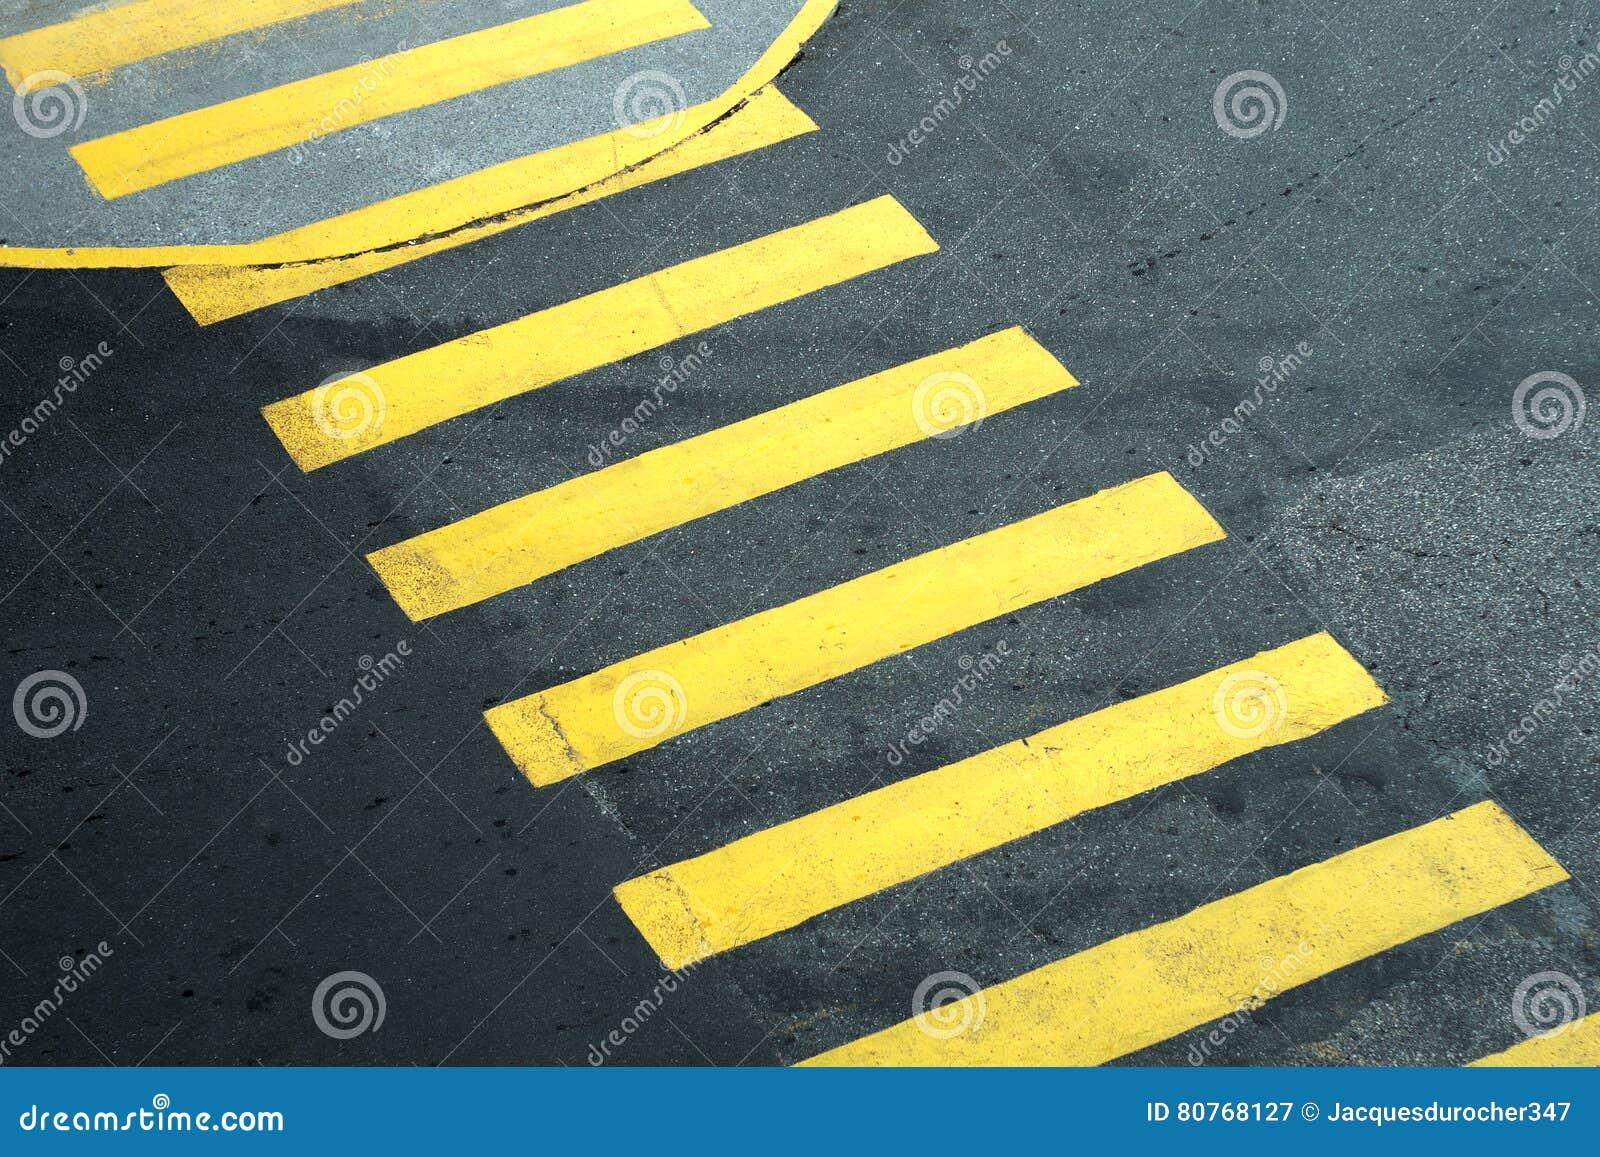 Line Drawing Of Zebra Crossing : Pedestrian yellow crossing asphalt lines walkway lane